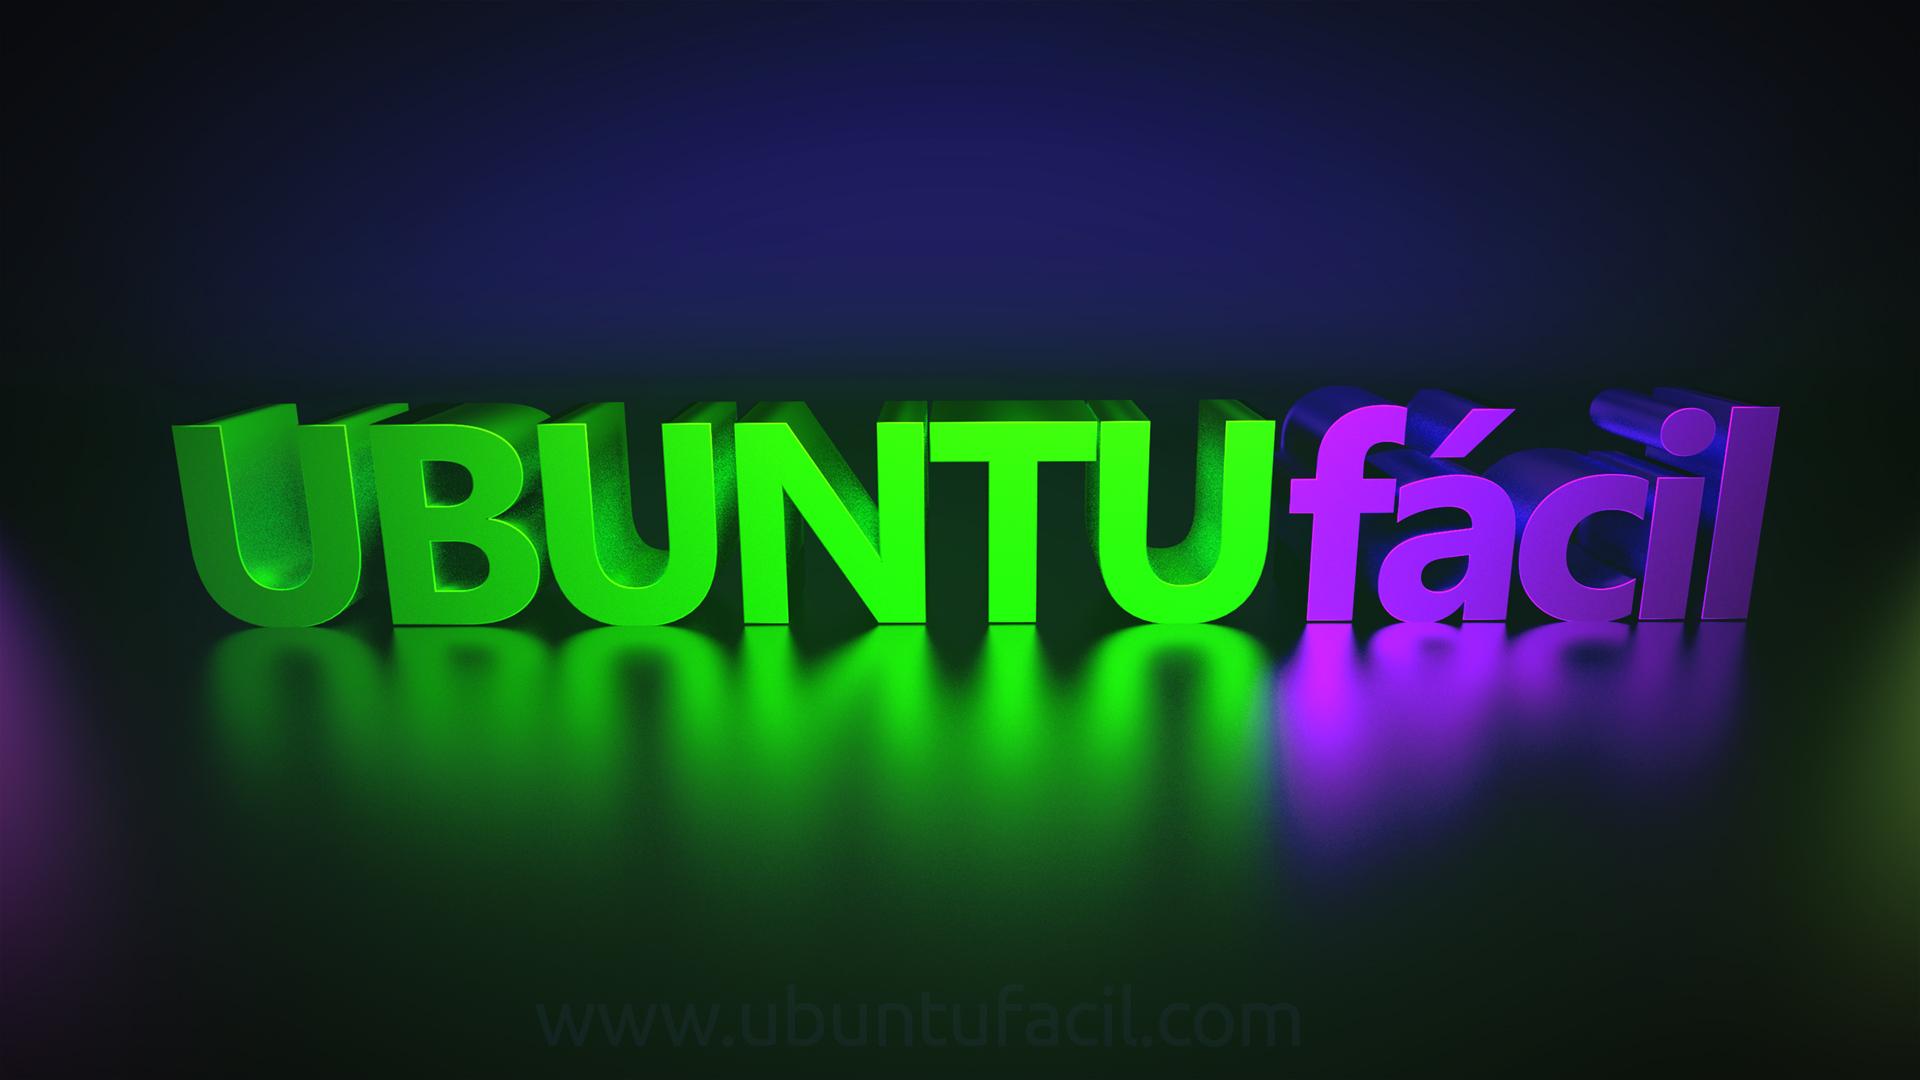 ubuntu-facil-blender-wallpaper-1080p-3